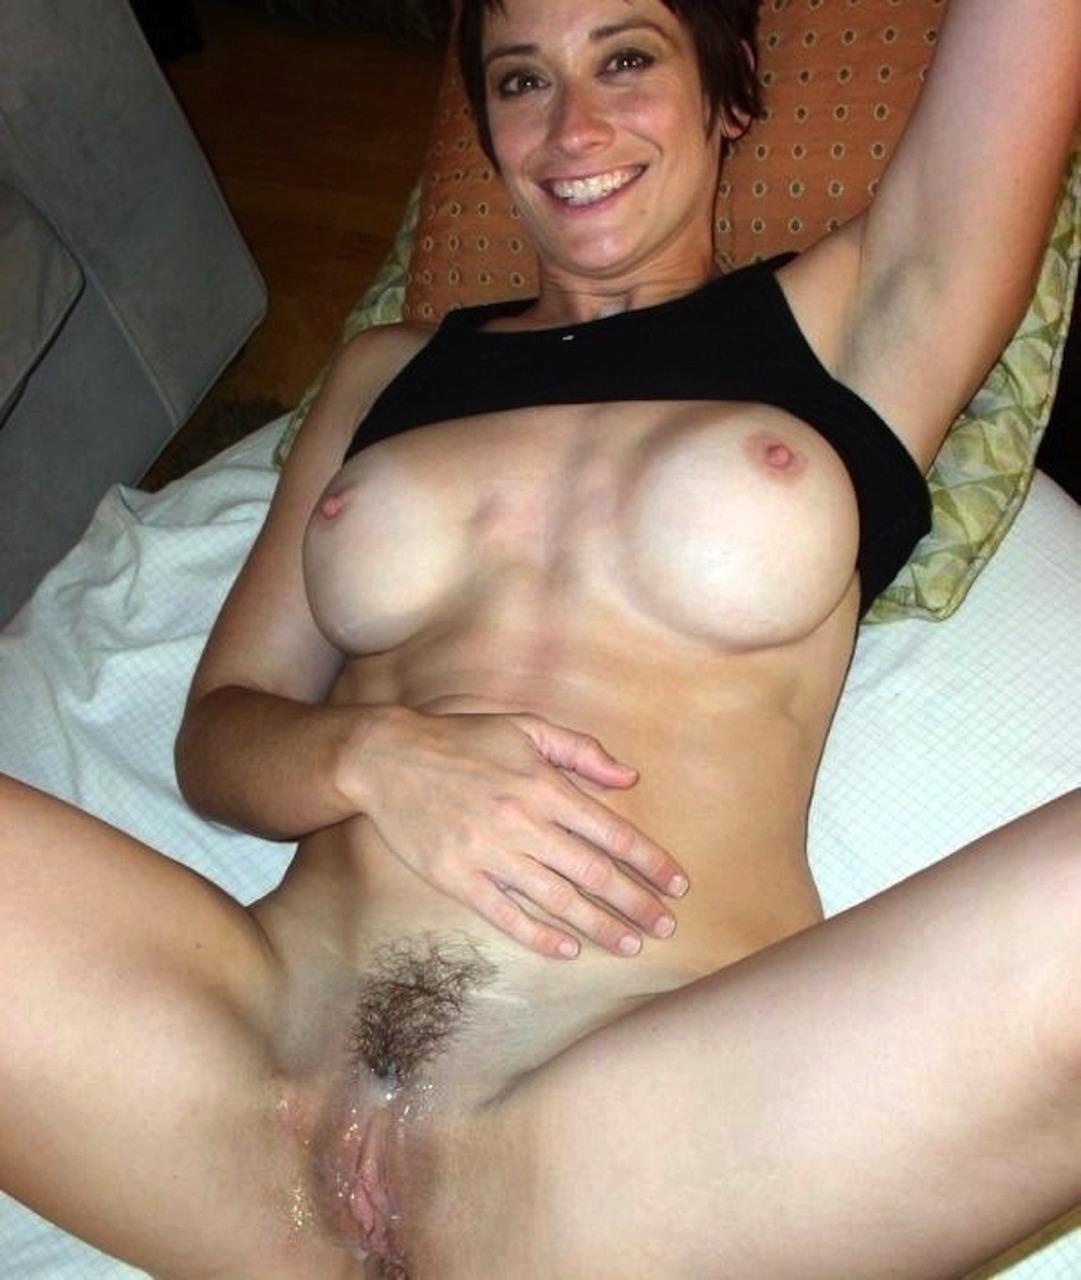 Naked Australian Women With Big Tits